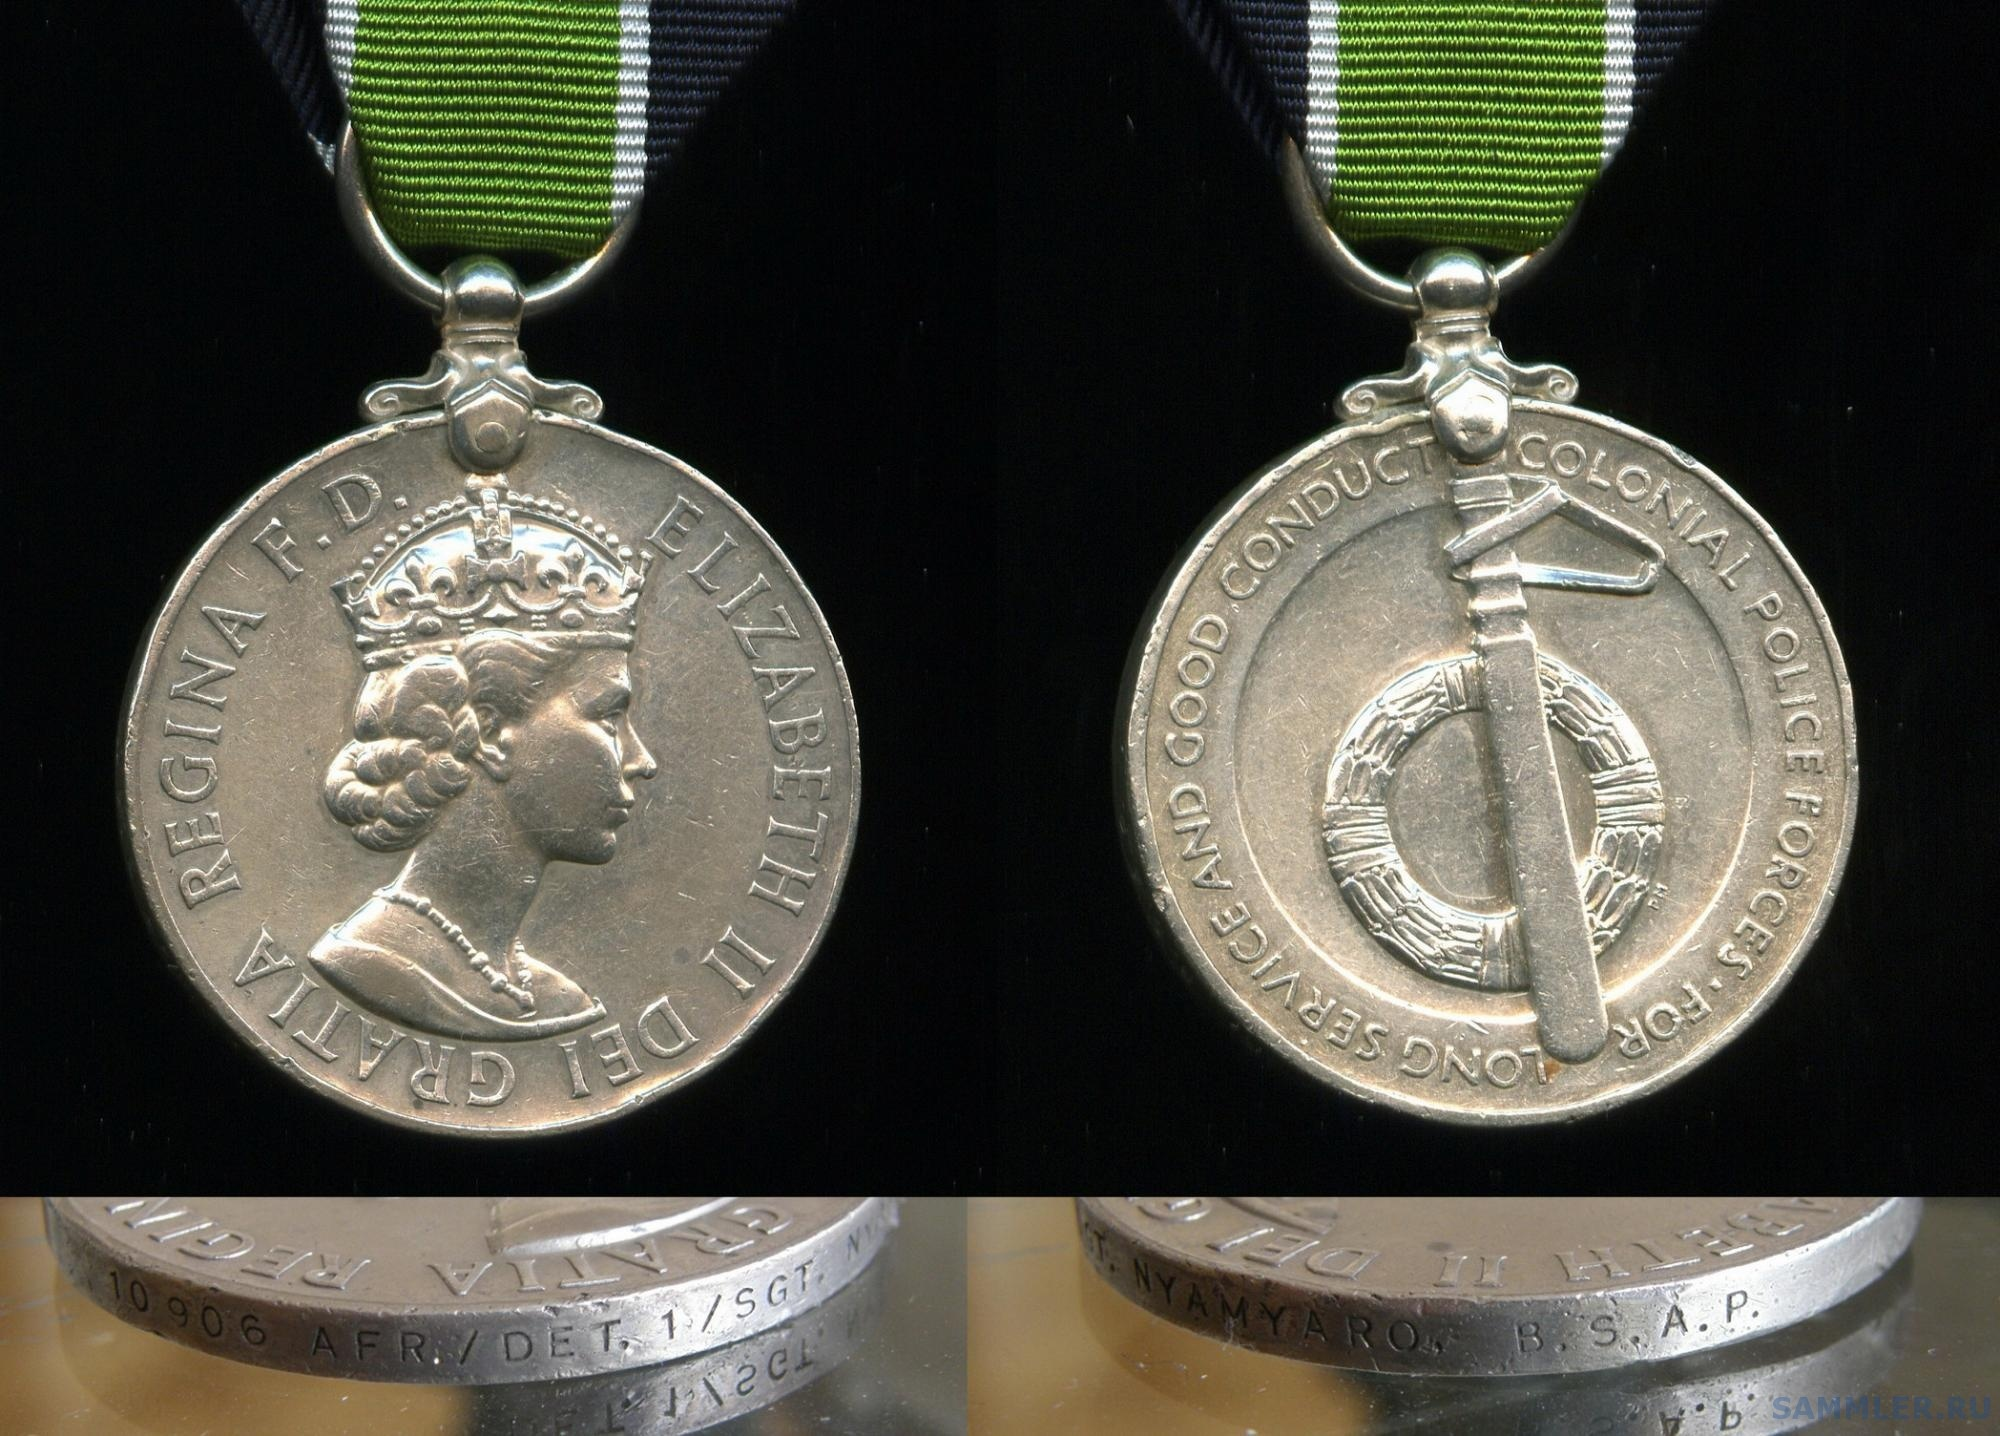 Colonial Police LS Medal to 10906 AFR.DET.1. SGT.NYAMYARO.B.S.A.P. (4).jpg